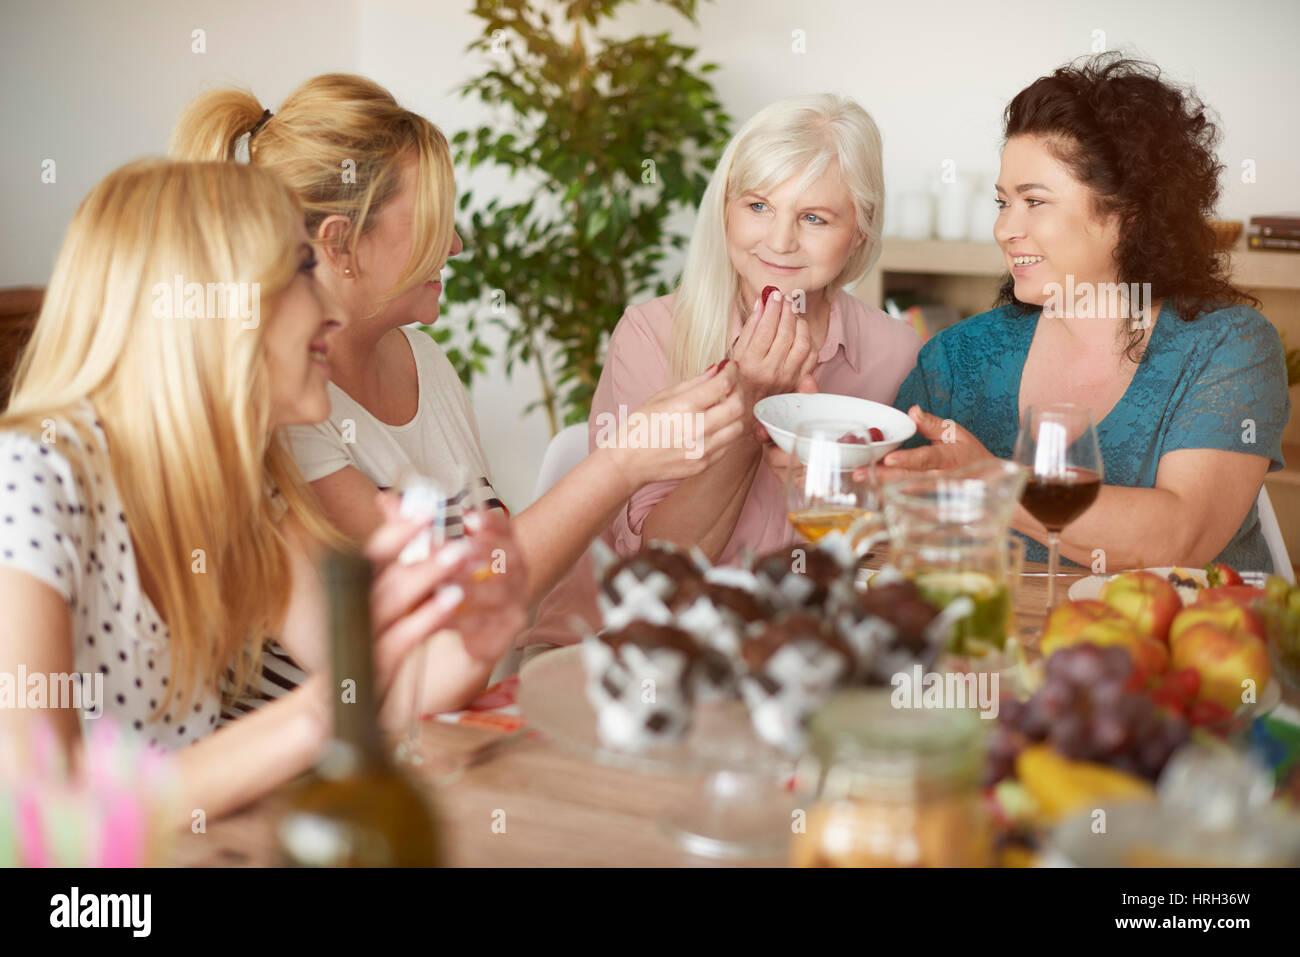 Good food and good moods - Stock Image